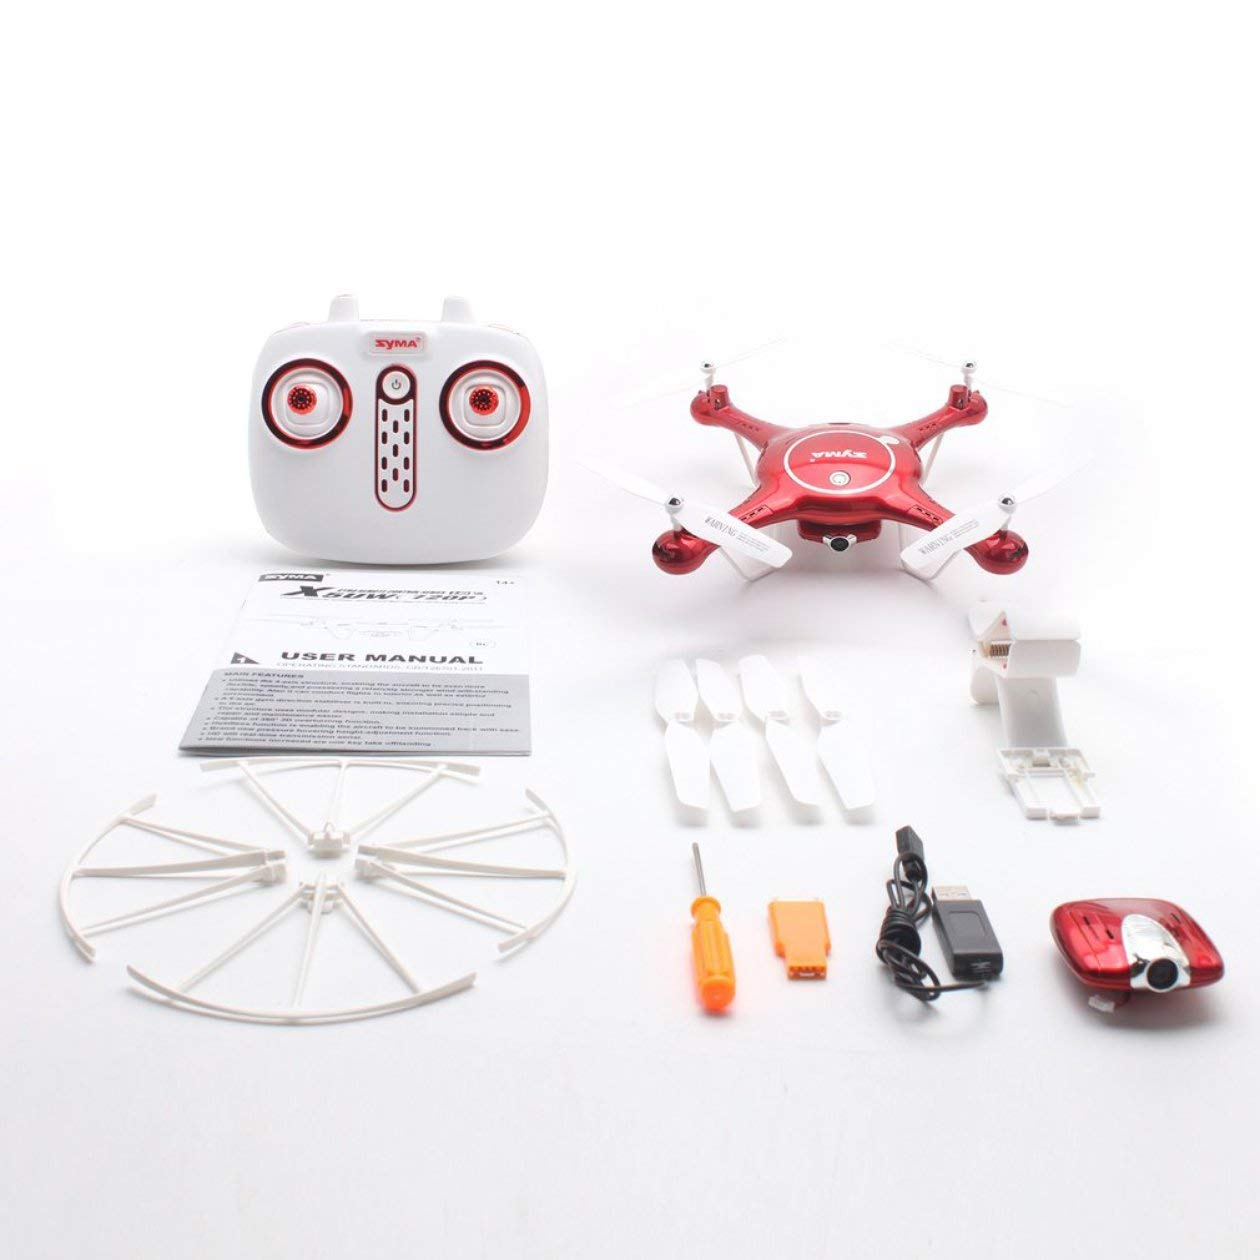 RC Drone Quadcopter, Wi-Fi-720P Kamera RC Drone Höhe Halten Headless Modus 3D-Flip-Flugplan RC Quadcopter mit 4 GB-Karte, Rot